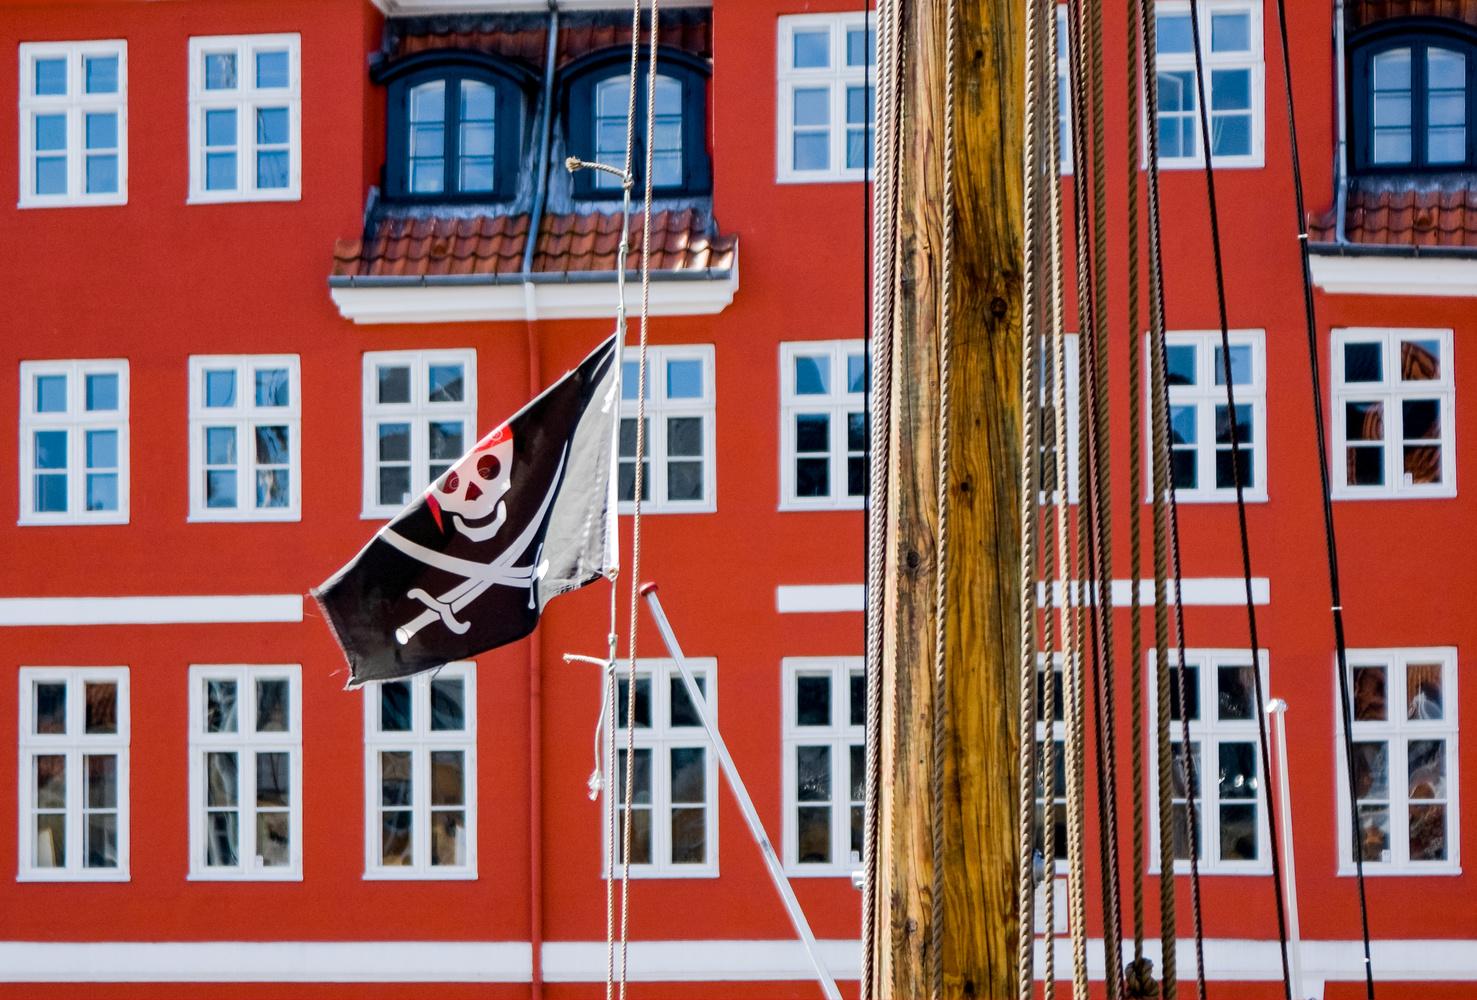 Jolly Roger by Chris Mummery